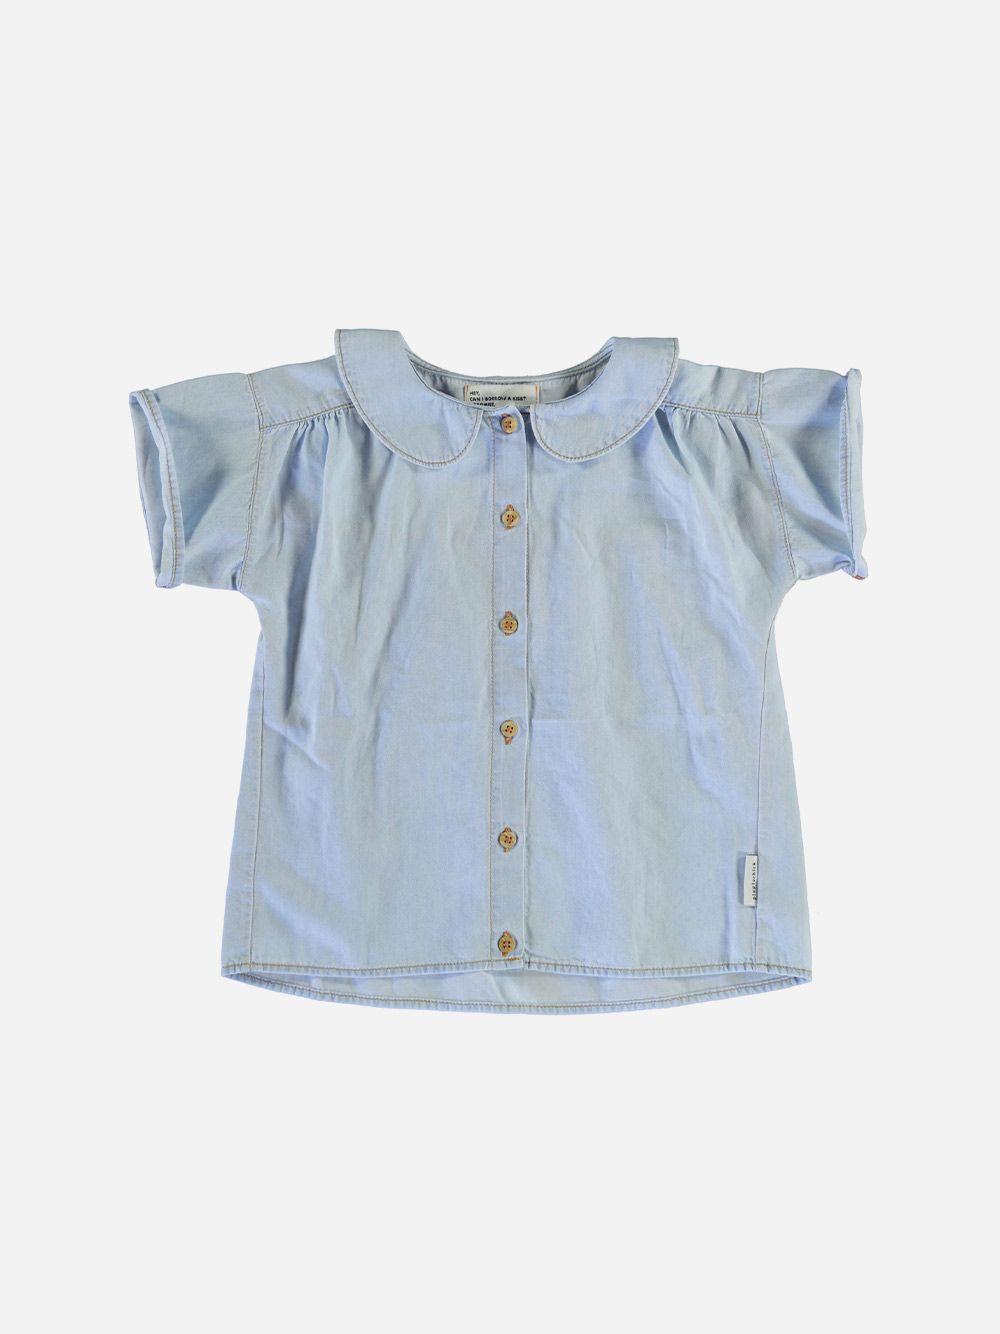 Peter Pan Shirt Light Blue Washed Denim